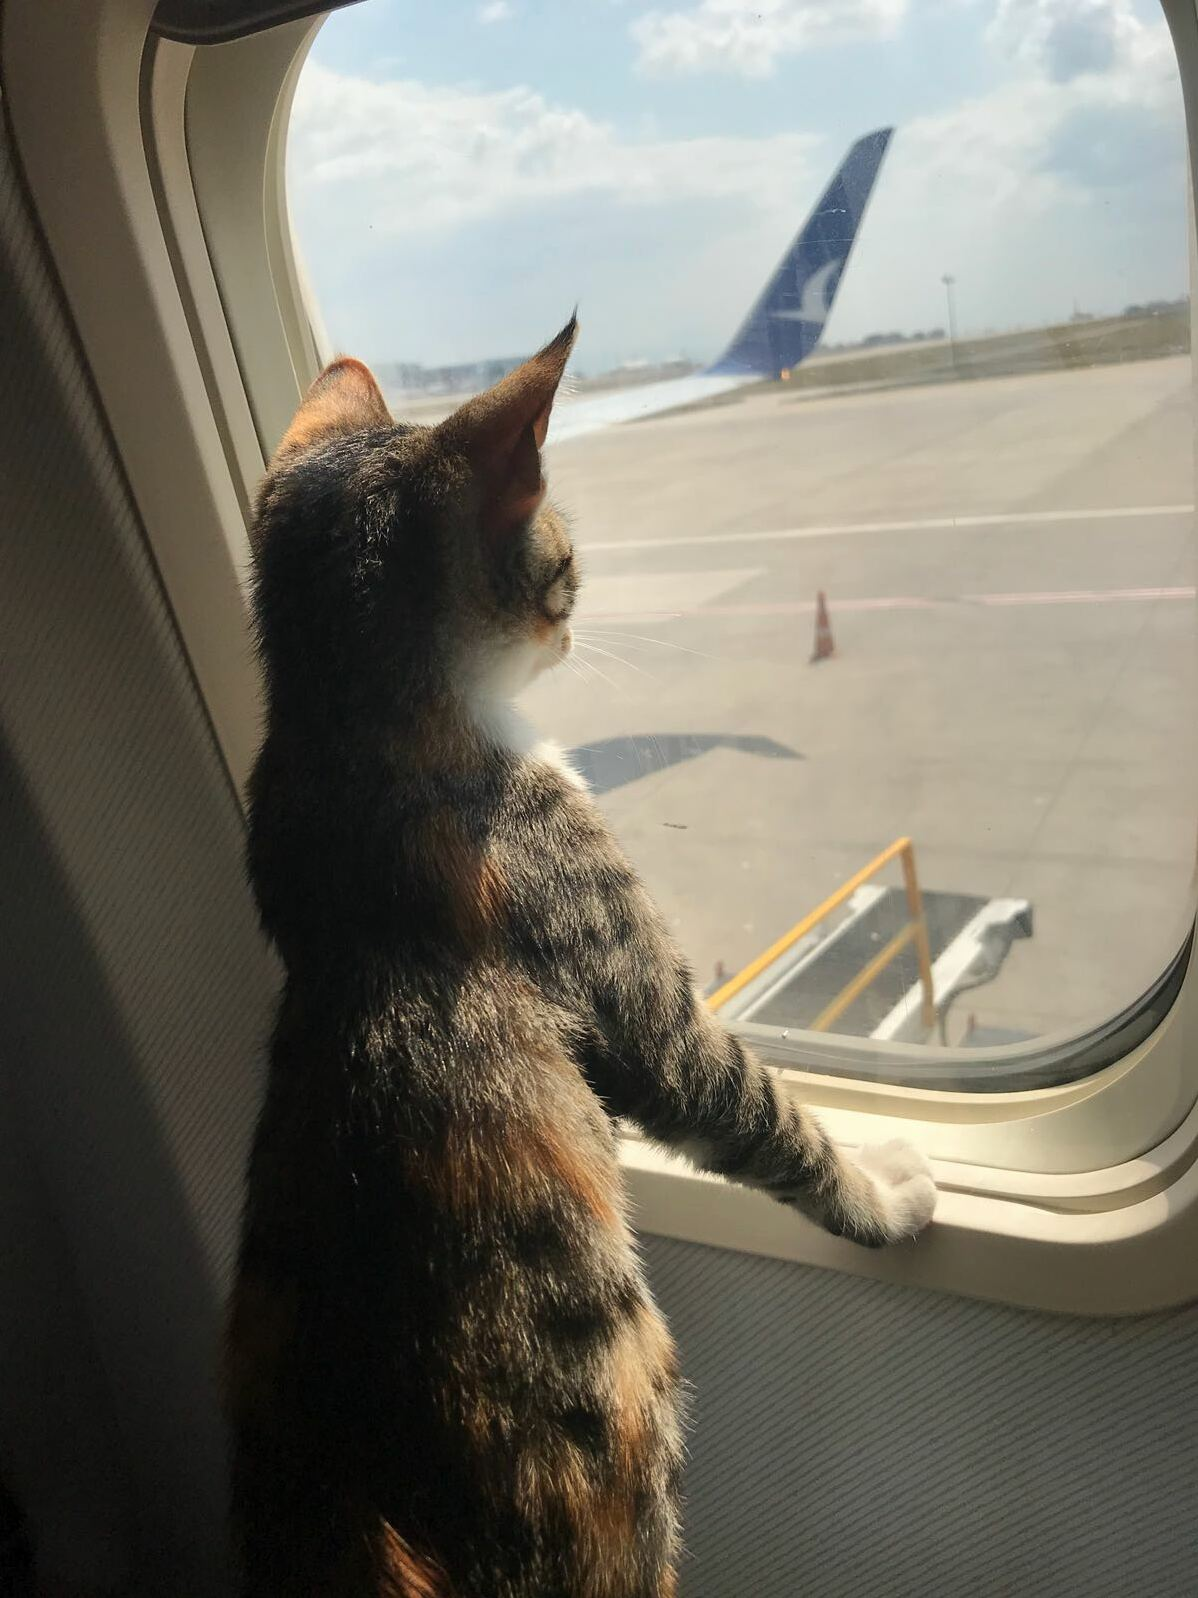 Kitten likes traveling